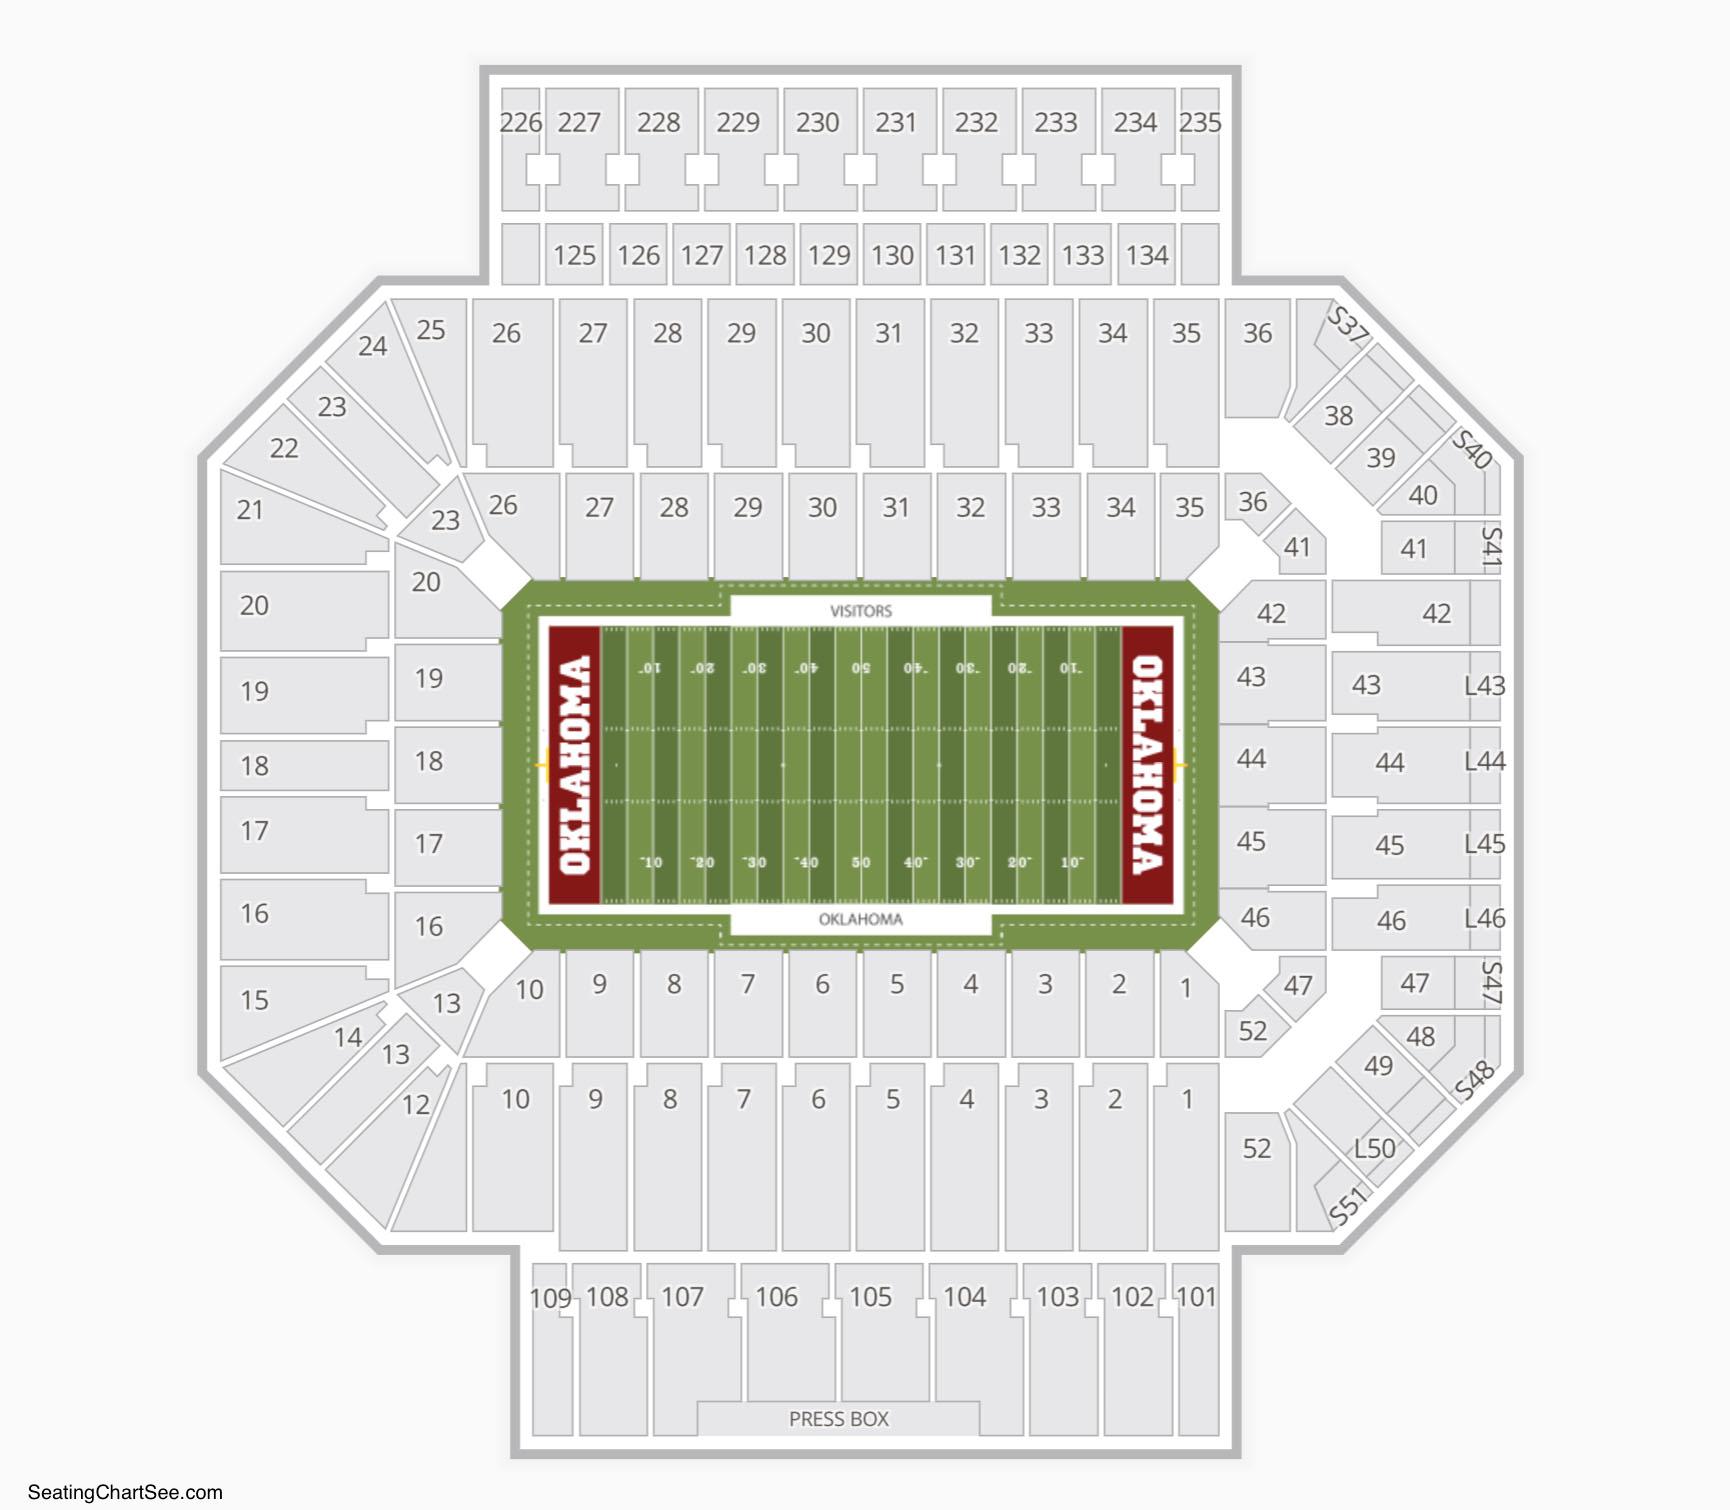 Gaylord Family-Oklahoma Memorial Stadium Seating Chart